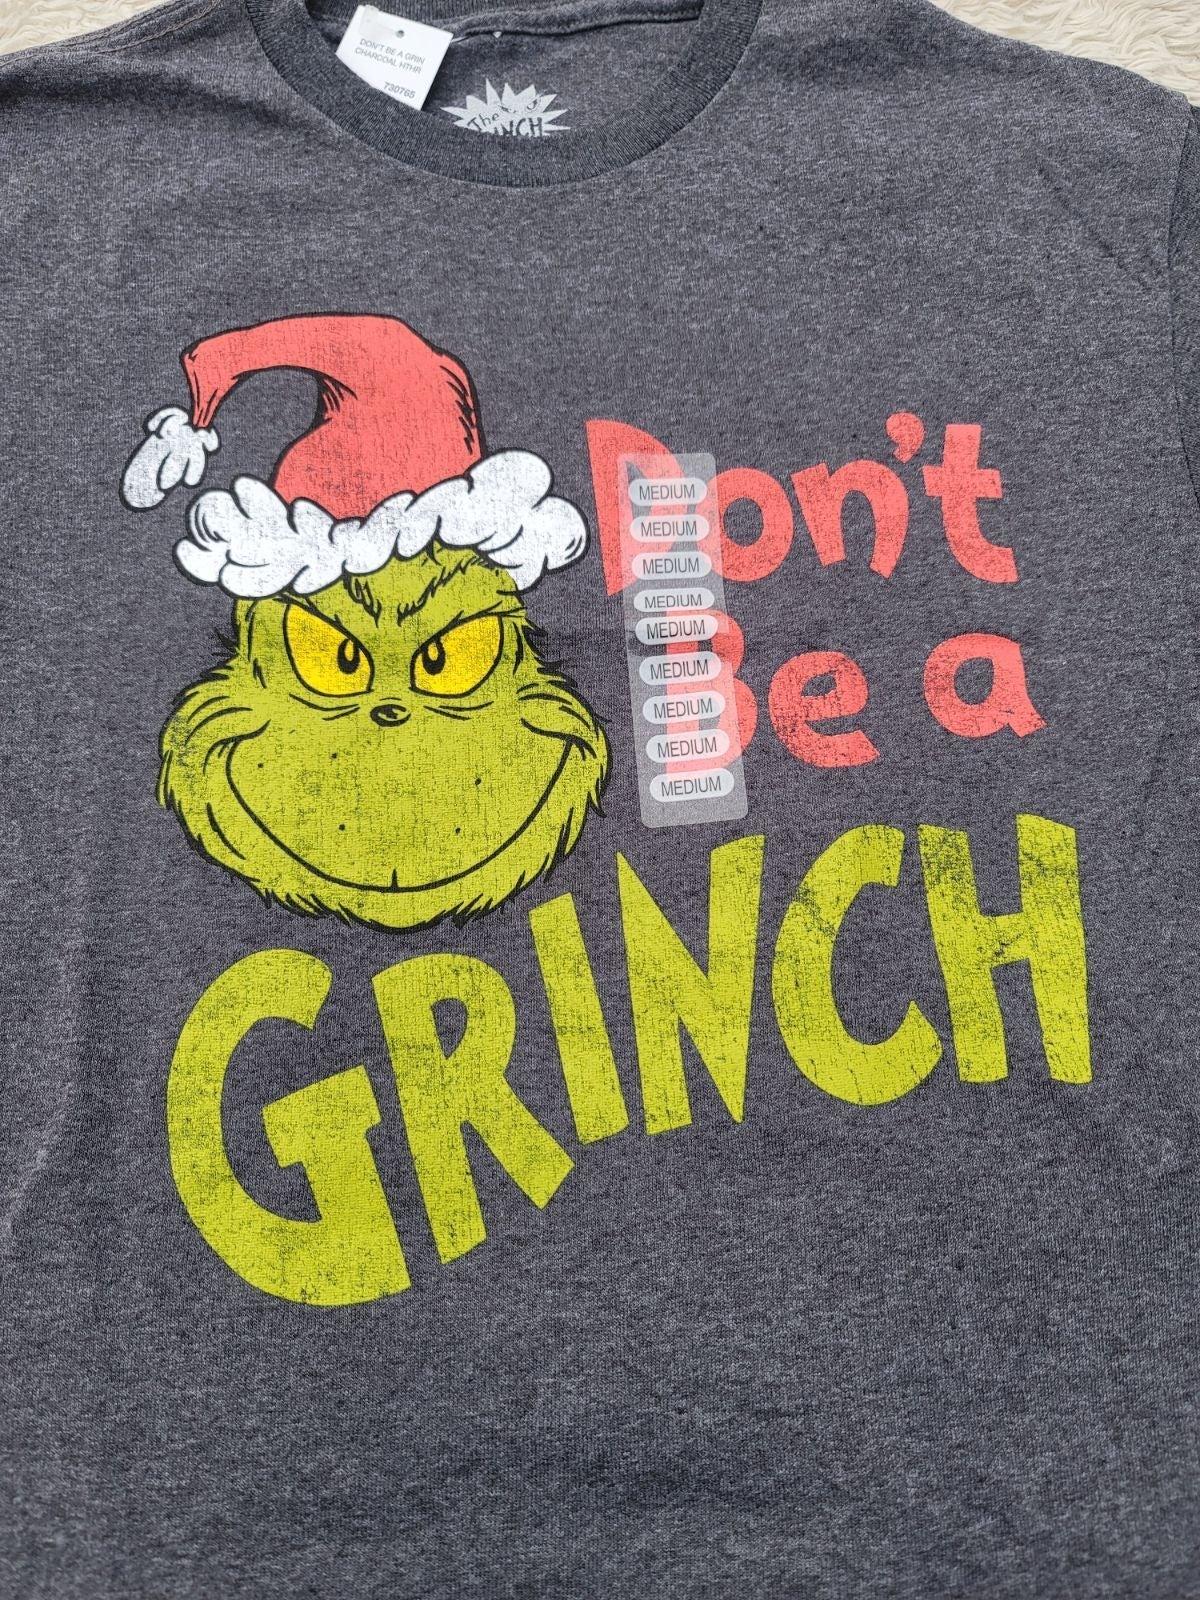 "XXL""Don't Be A Grinch"" T-Shirt Dr. Seuss"